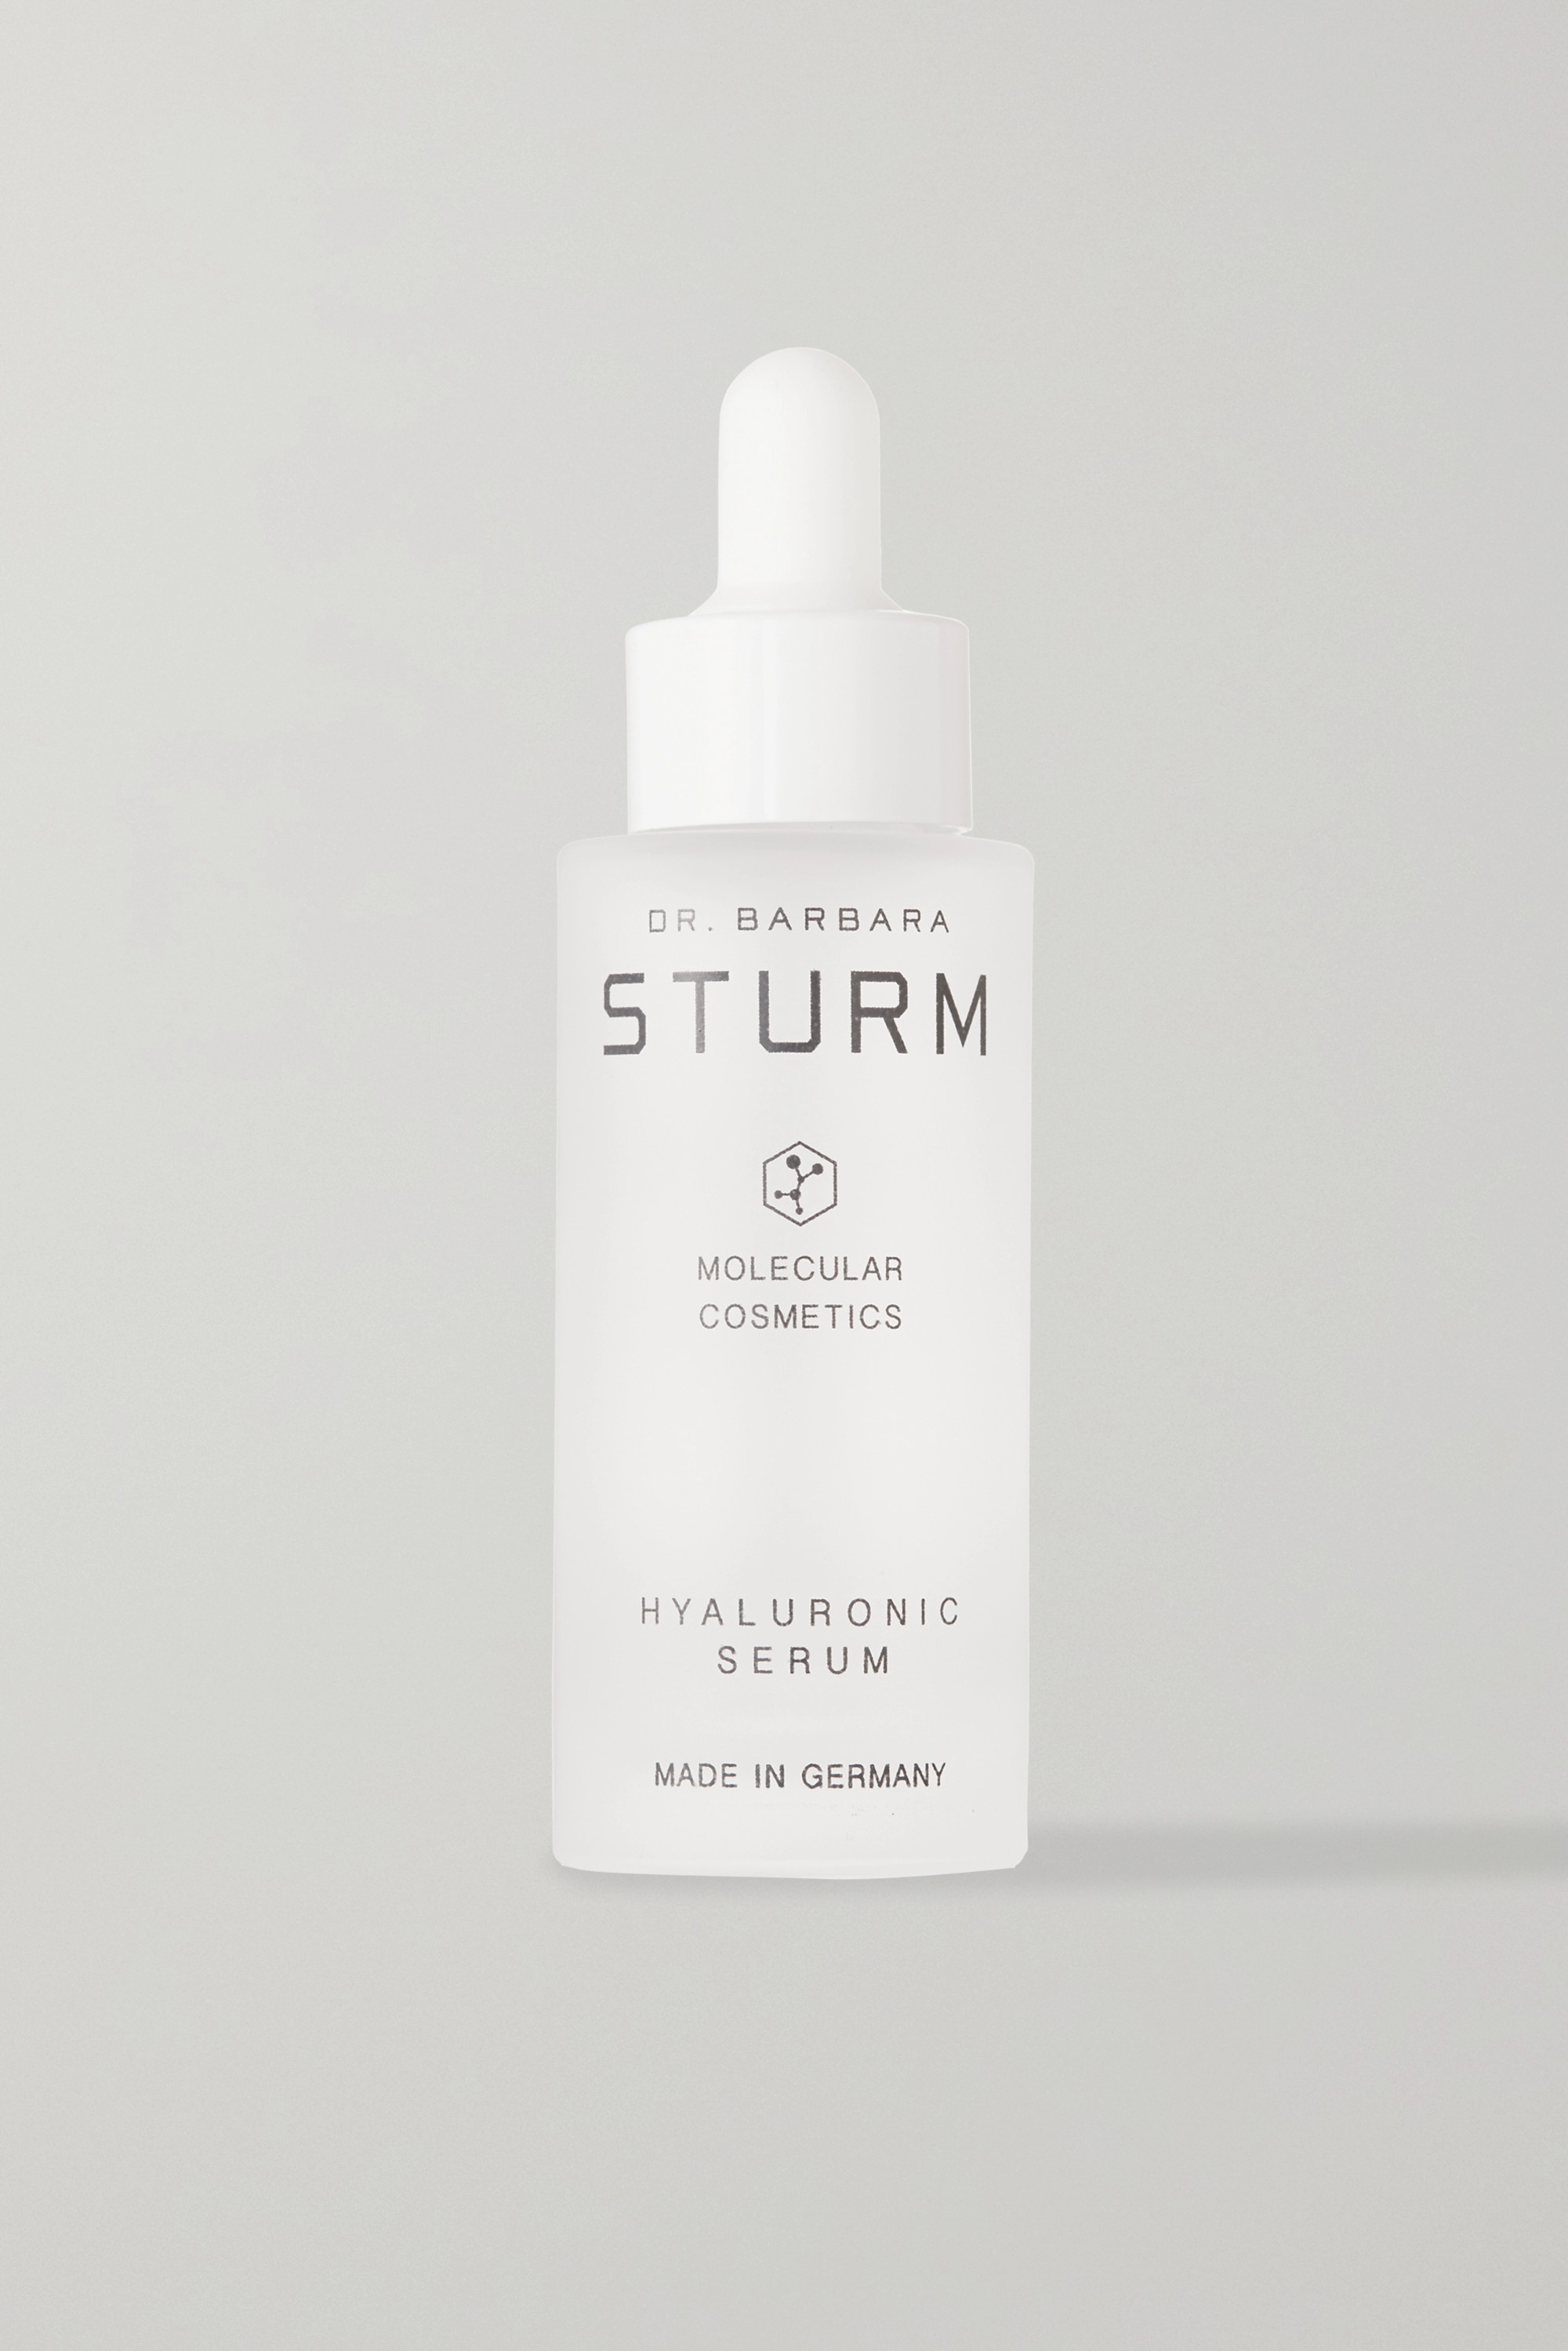 Dr. Barbara Sturm Hyaluronic Serum, 30ml